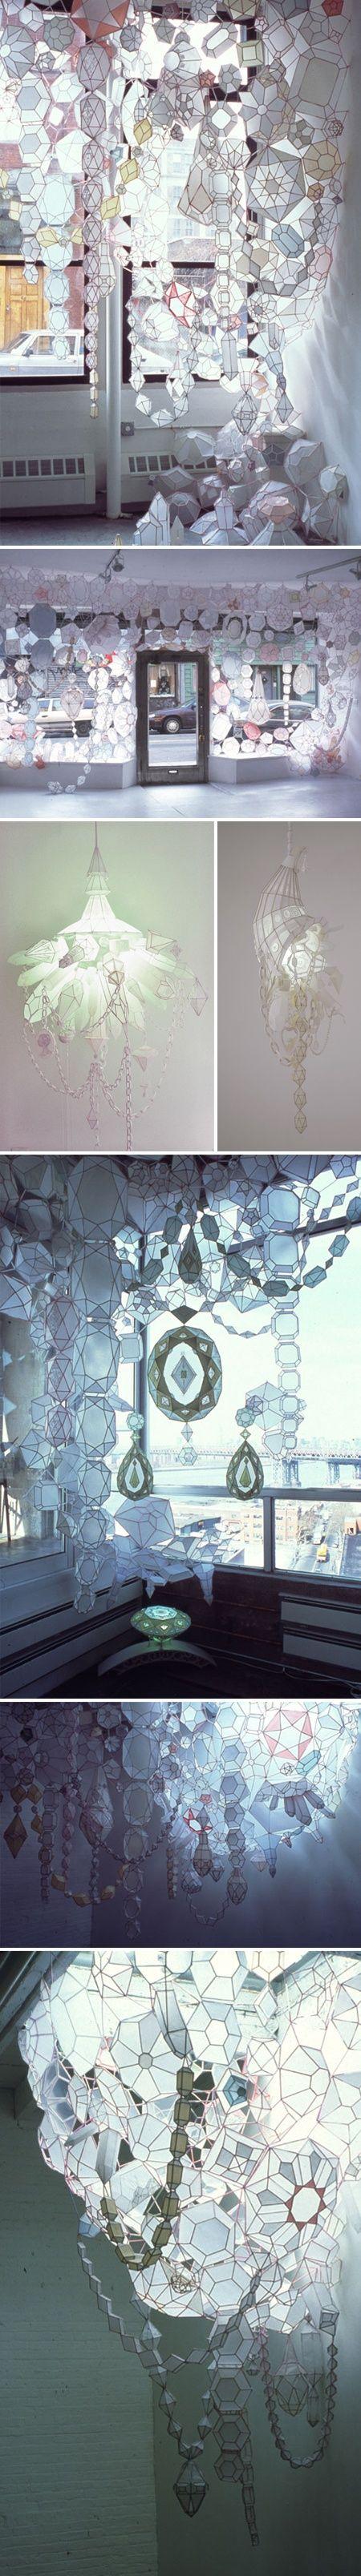 paper/mixed media installation artist Kirsten Hassenfeld